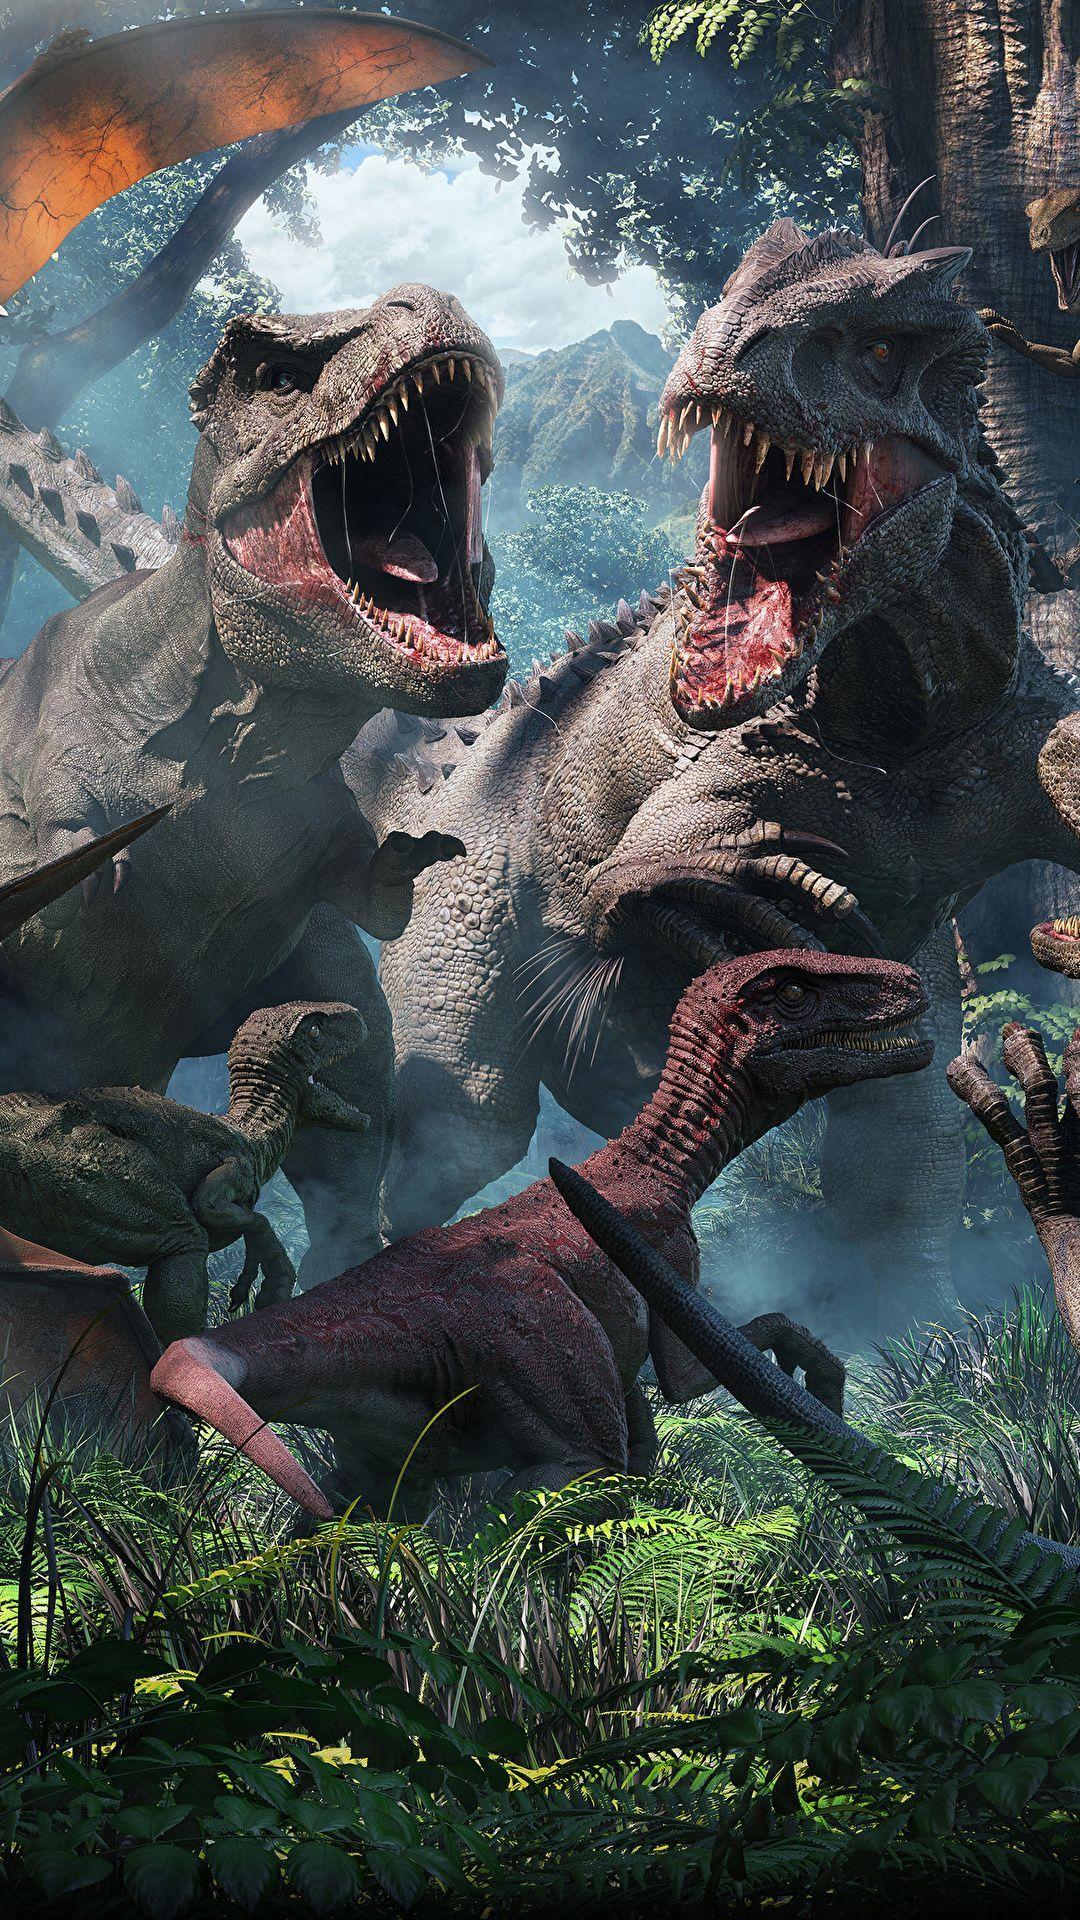 Indominus Rex Jurassic World Wallpaper Ios In 2020 Jurassic